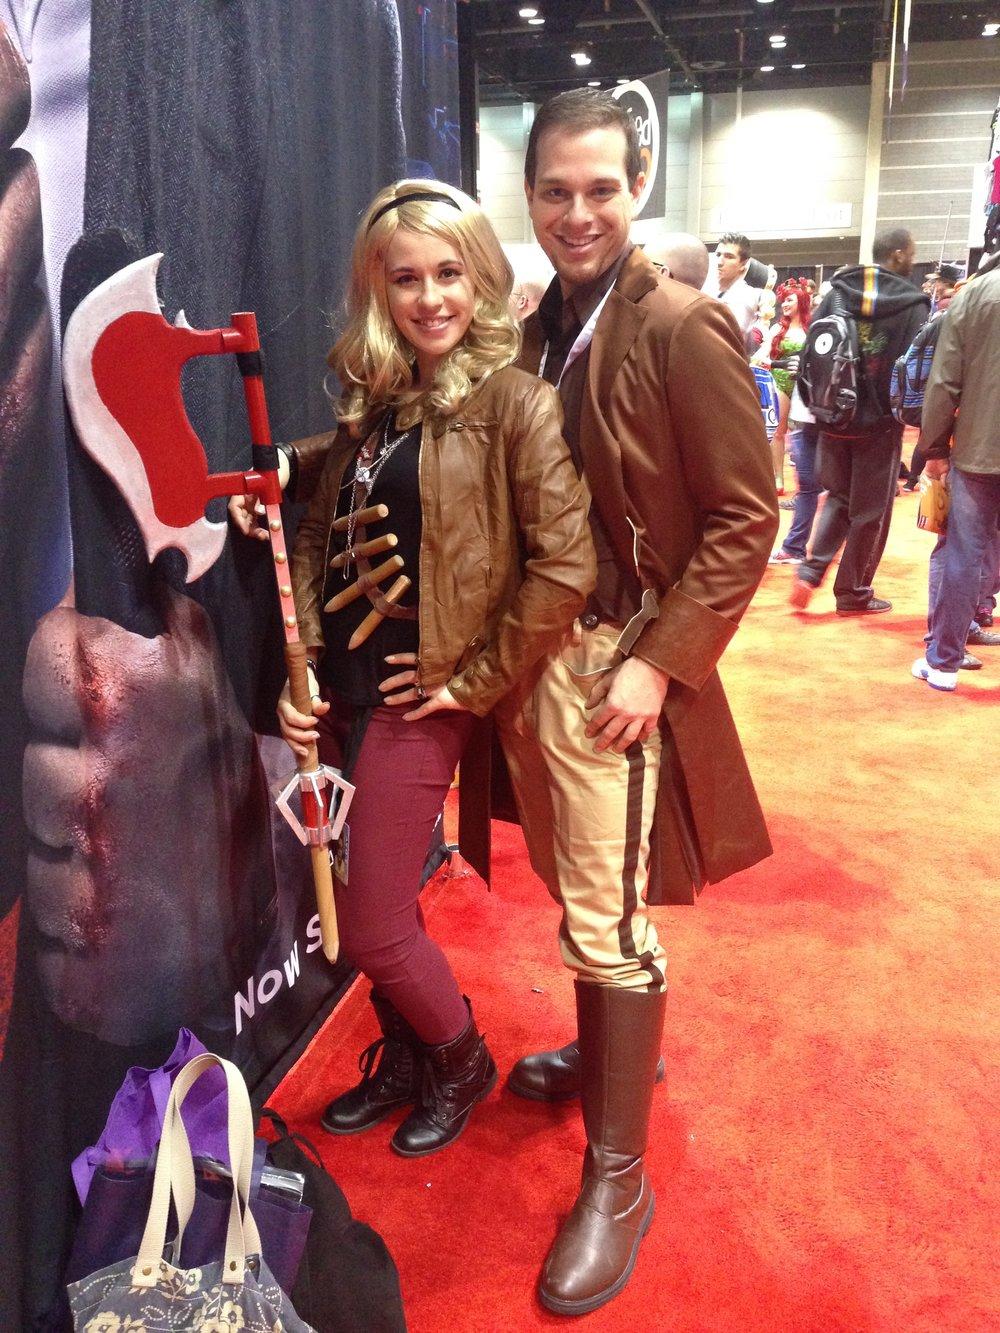 Browncoats!